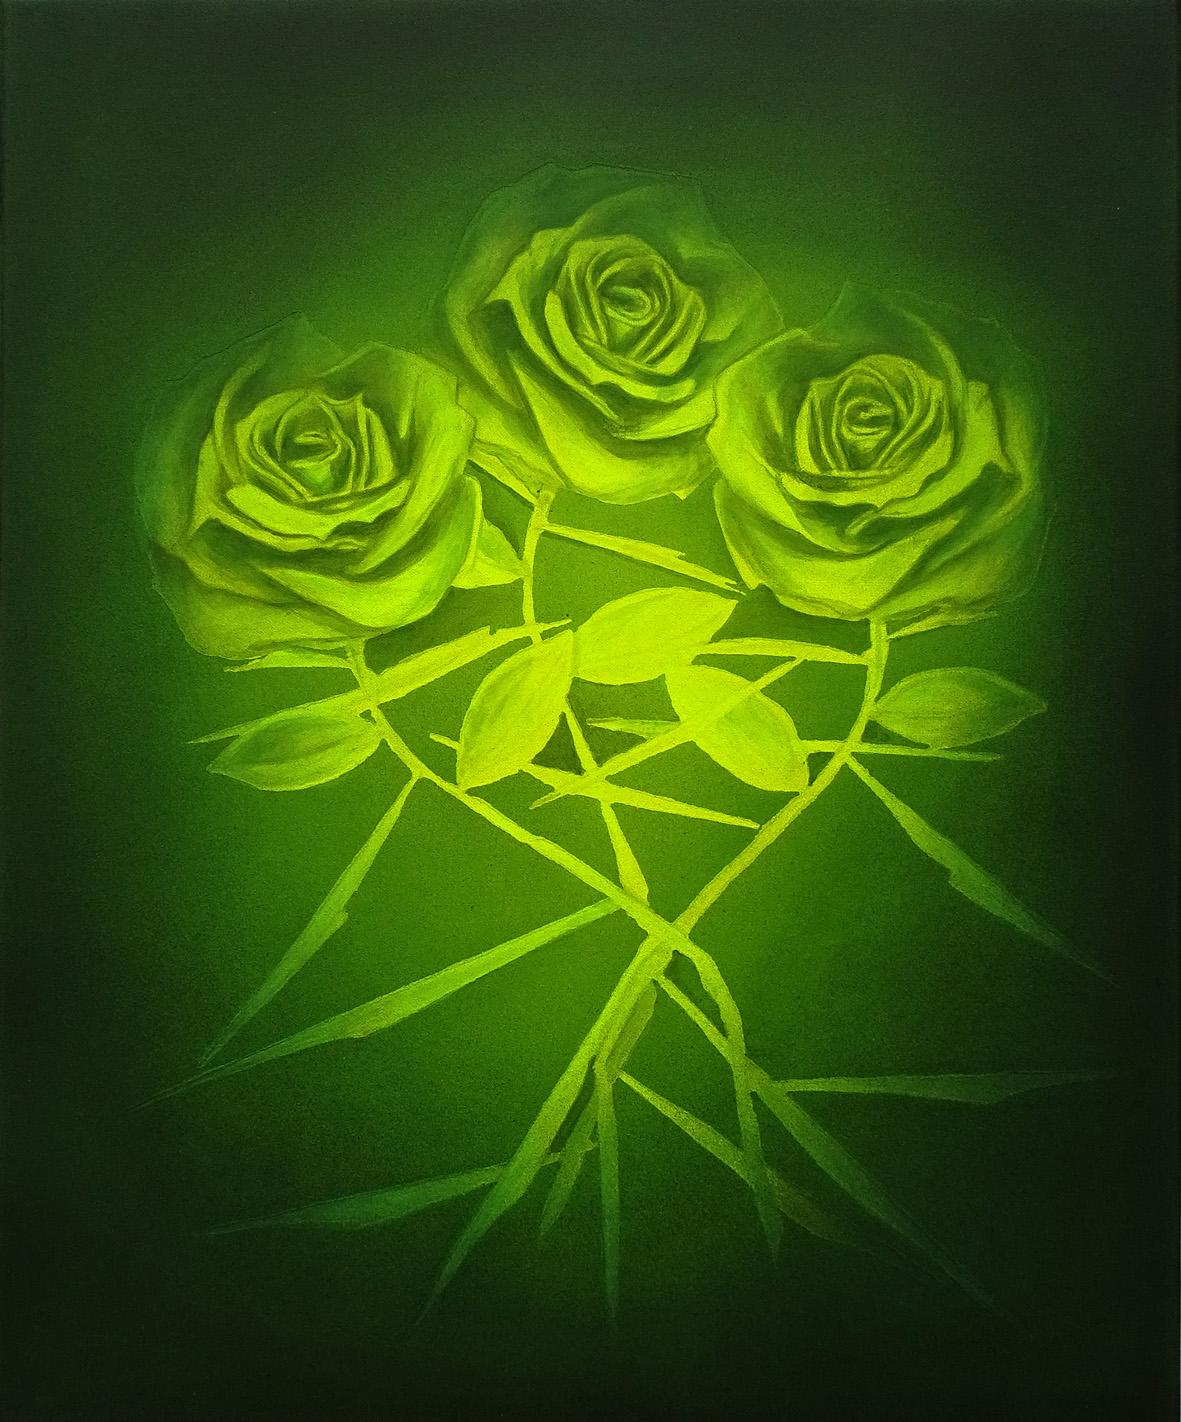 roses vertes